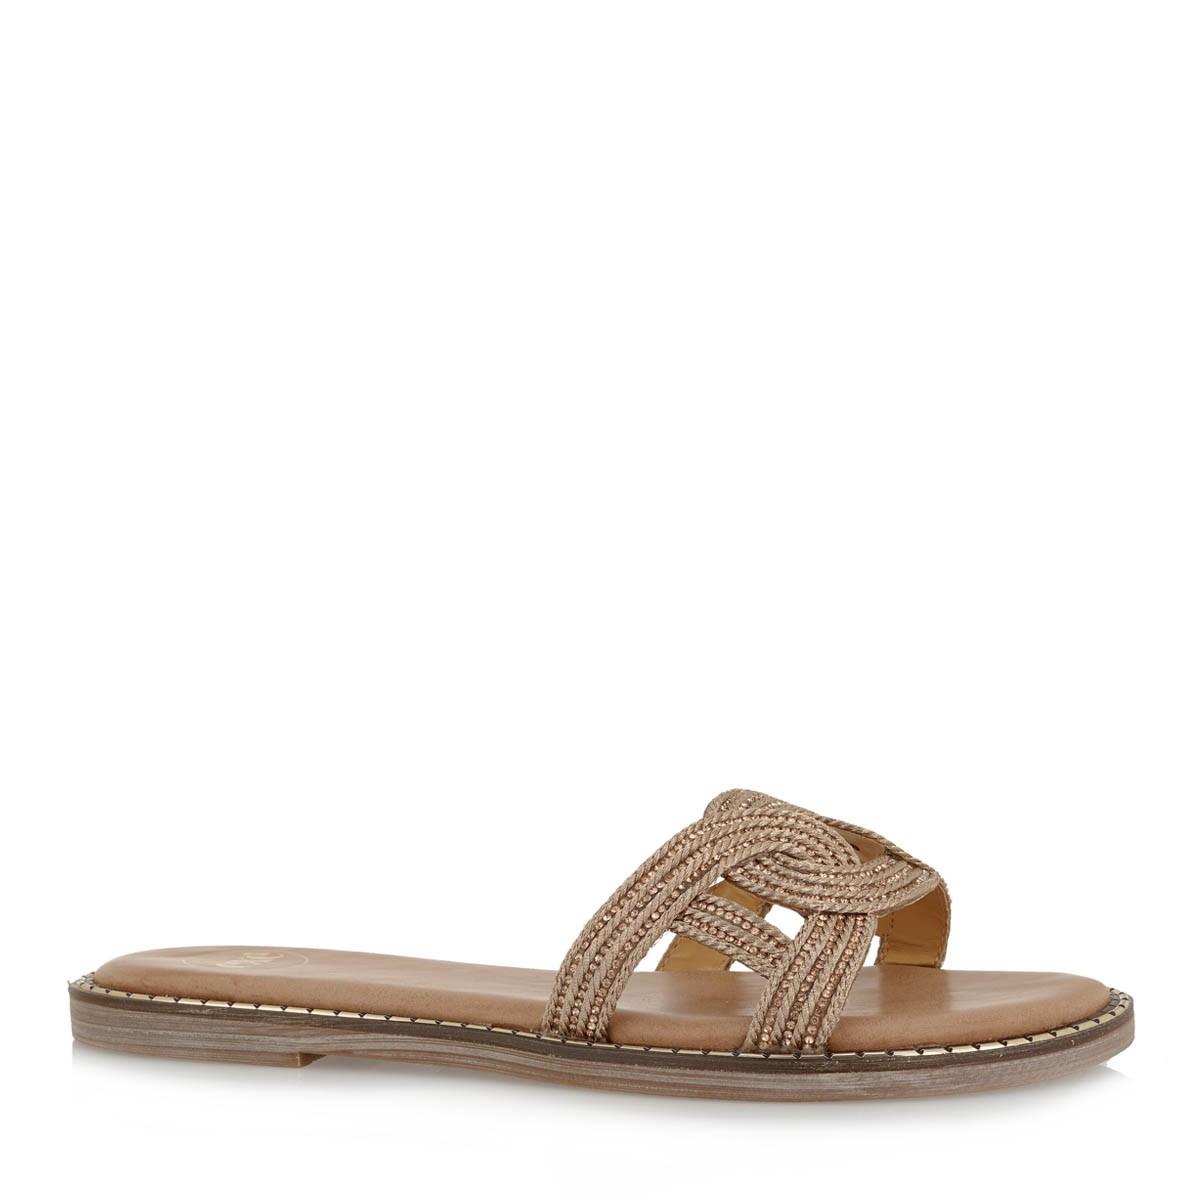 EXE Shoes Γυναικείες Παντόφλες ALLISON-139 Χρυσό Πλεκτό K4700139176M